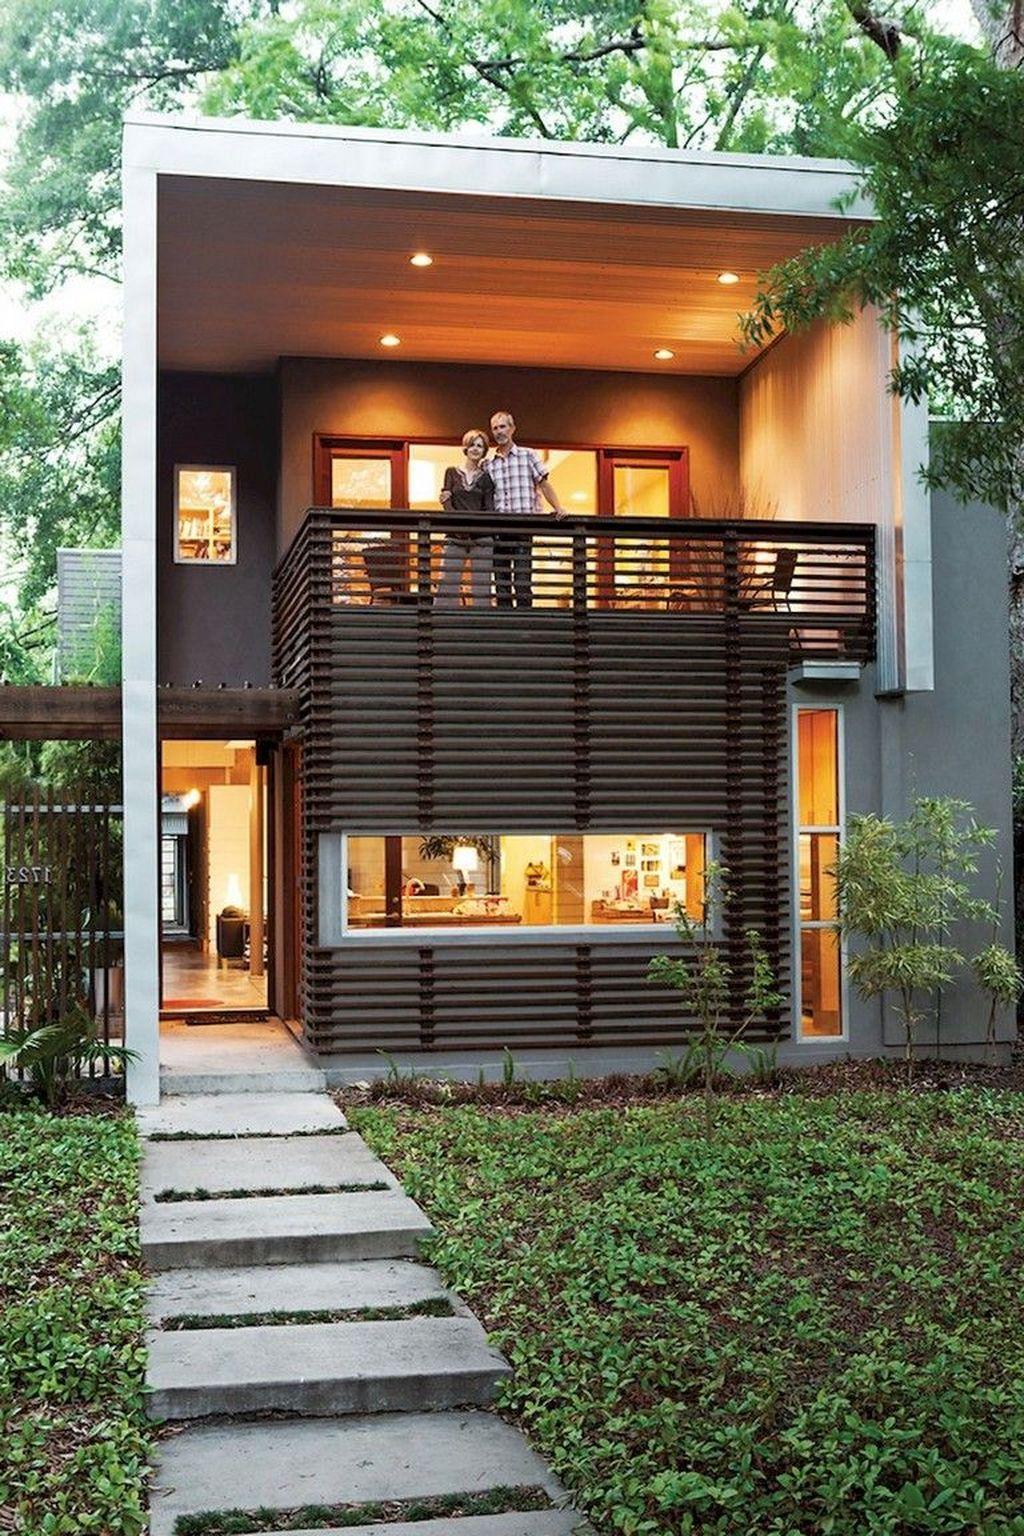 33 Stunning Small House Design Ideas Small House Design Small House Design Architecture House Architecture Design